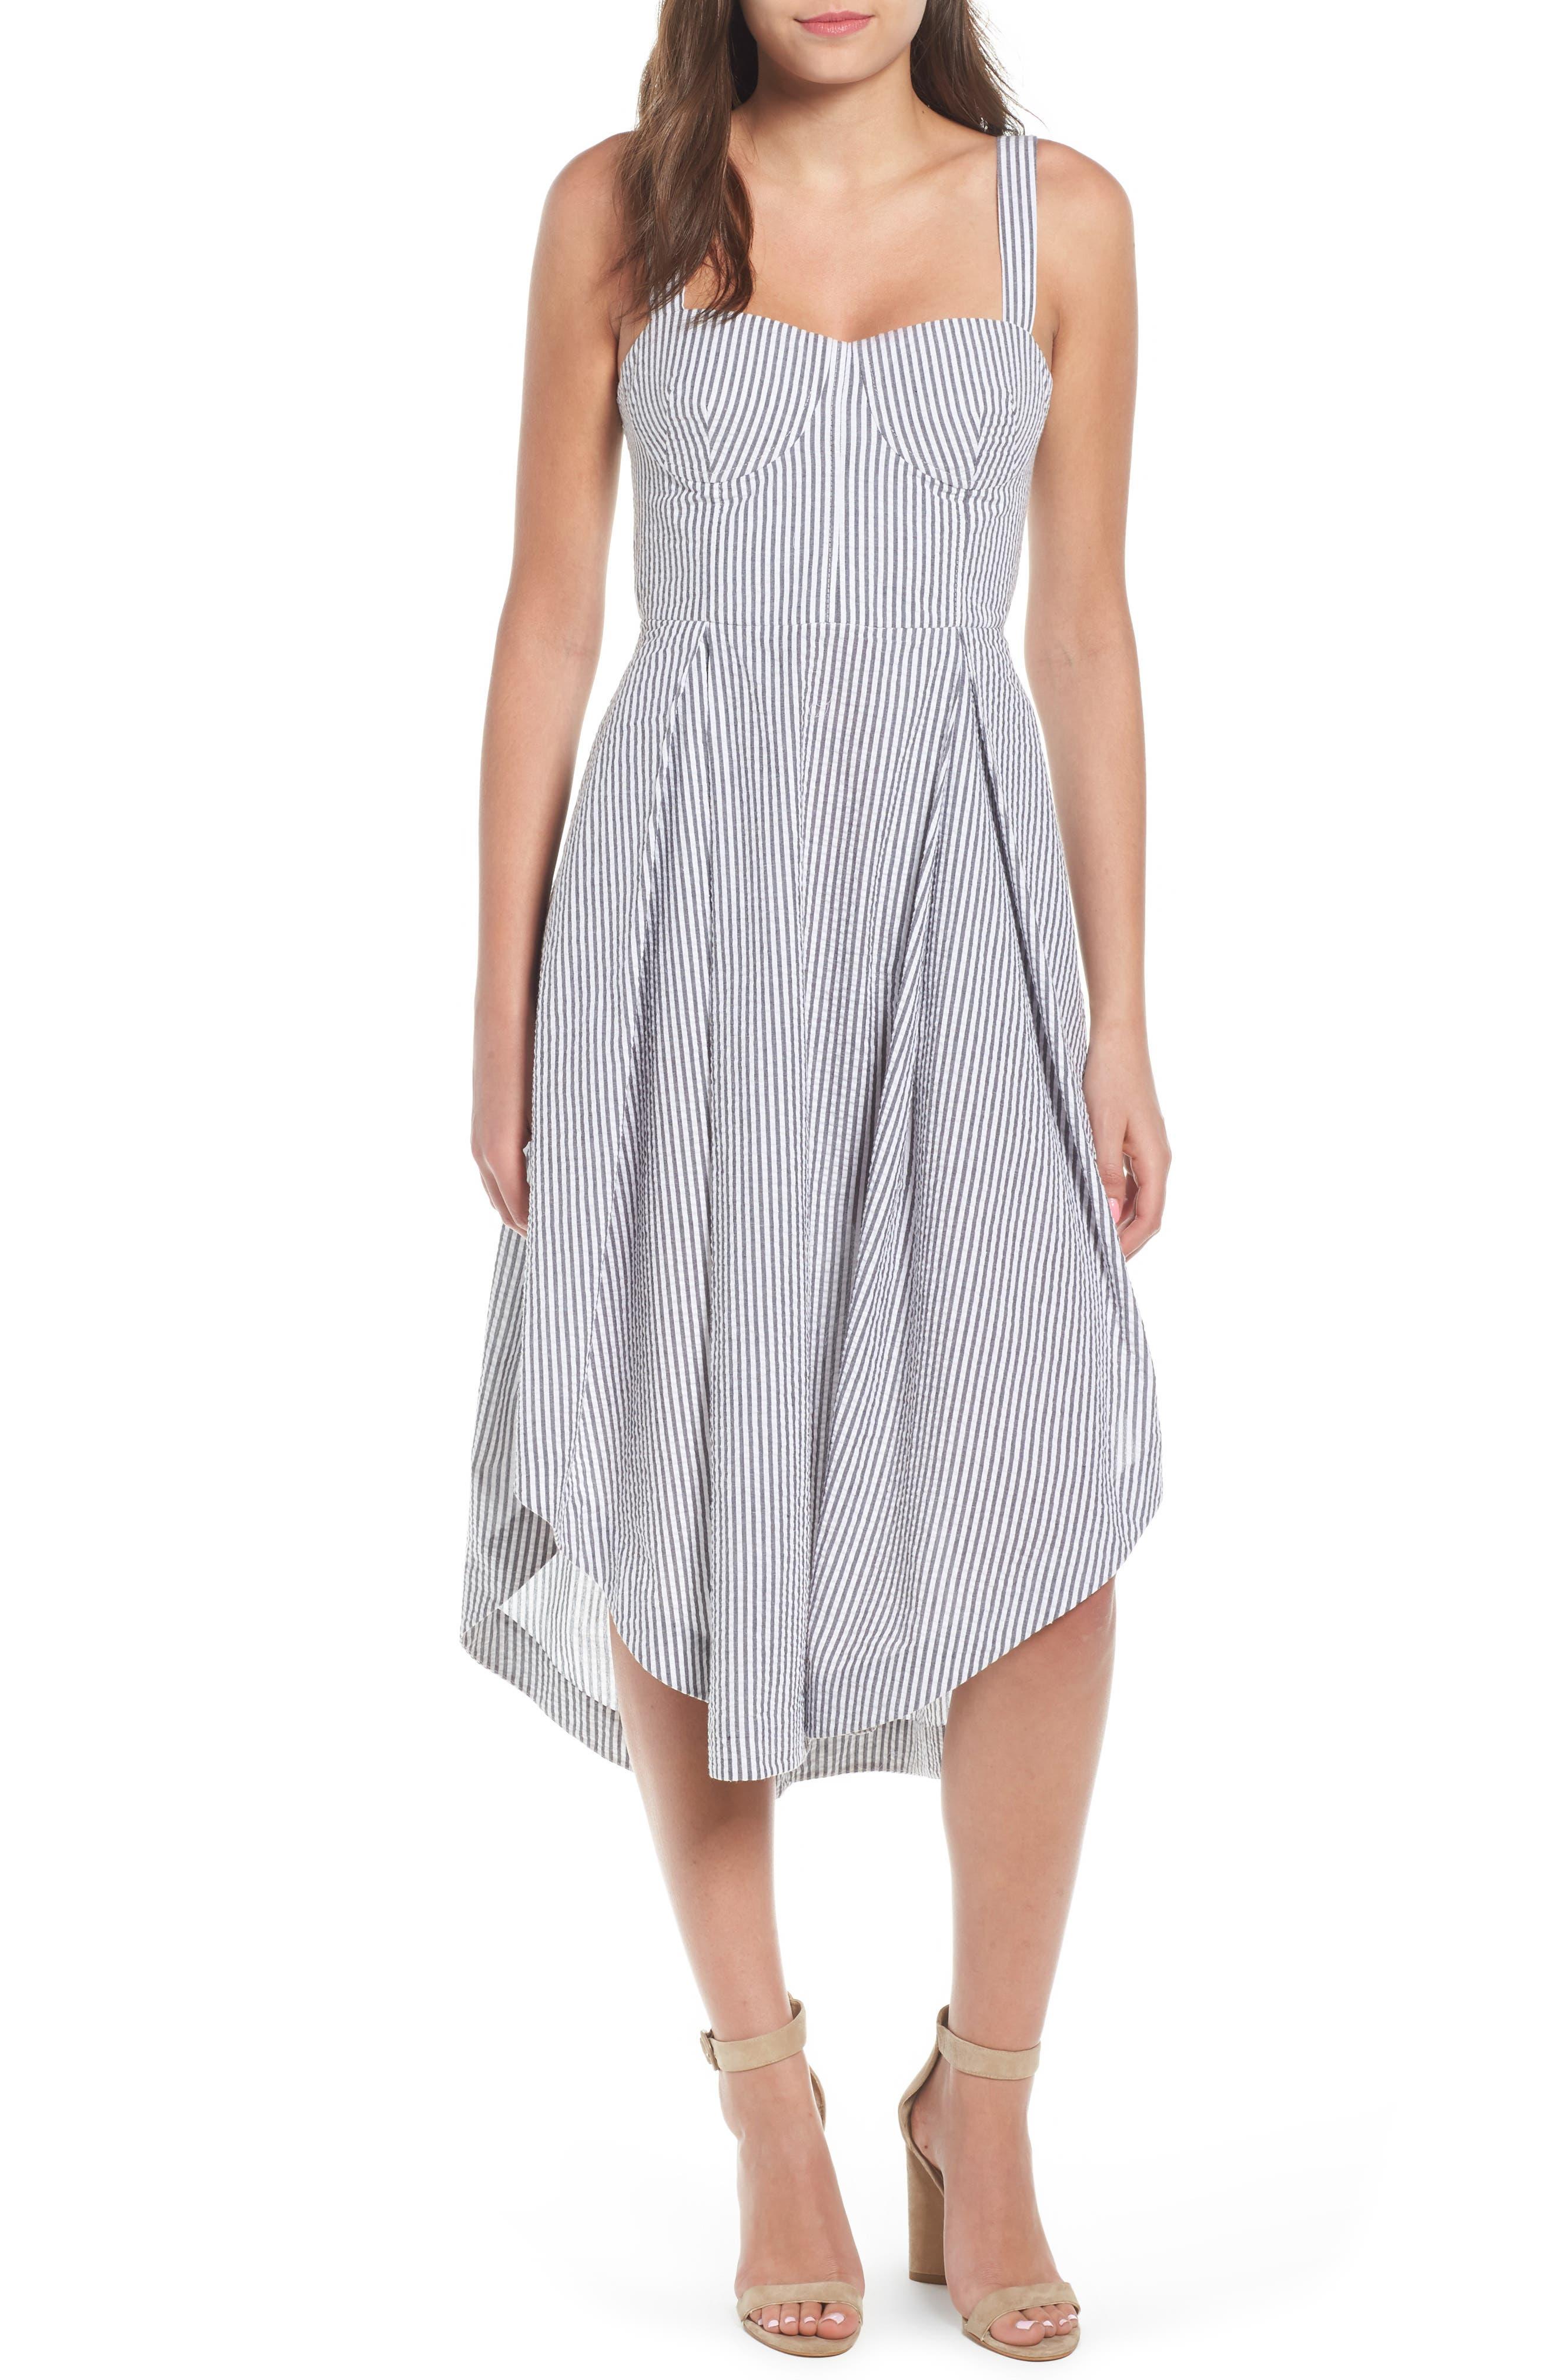 Seersucker Bustier Midi Dress,                             Main thumbnail 1, color,                             002